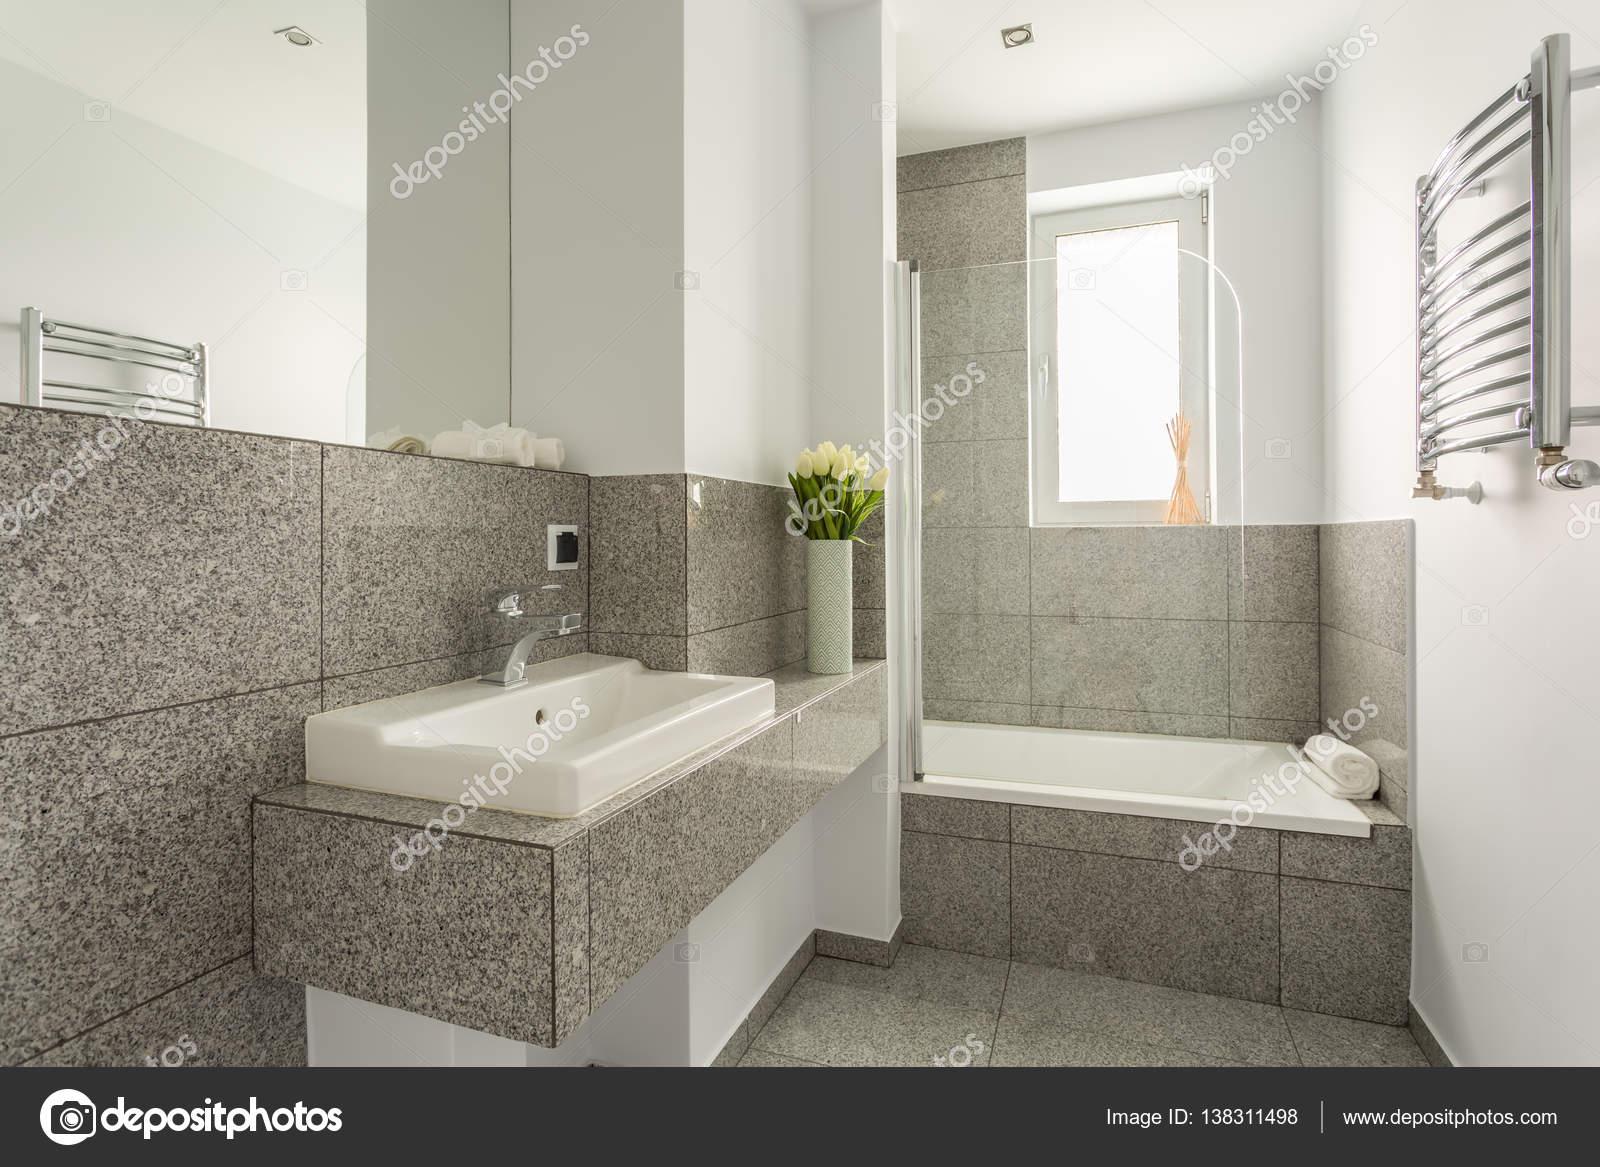 https://st3.depositphotos.com/2249091/13831/i/1600/depositphotos_138311498-stockafbeelding-minimalistische-wastafel-in-granieten-badkamer.jpg